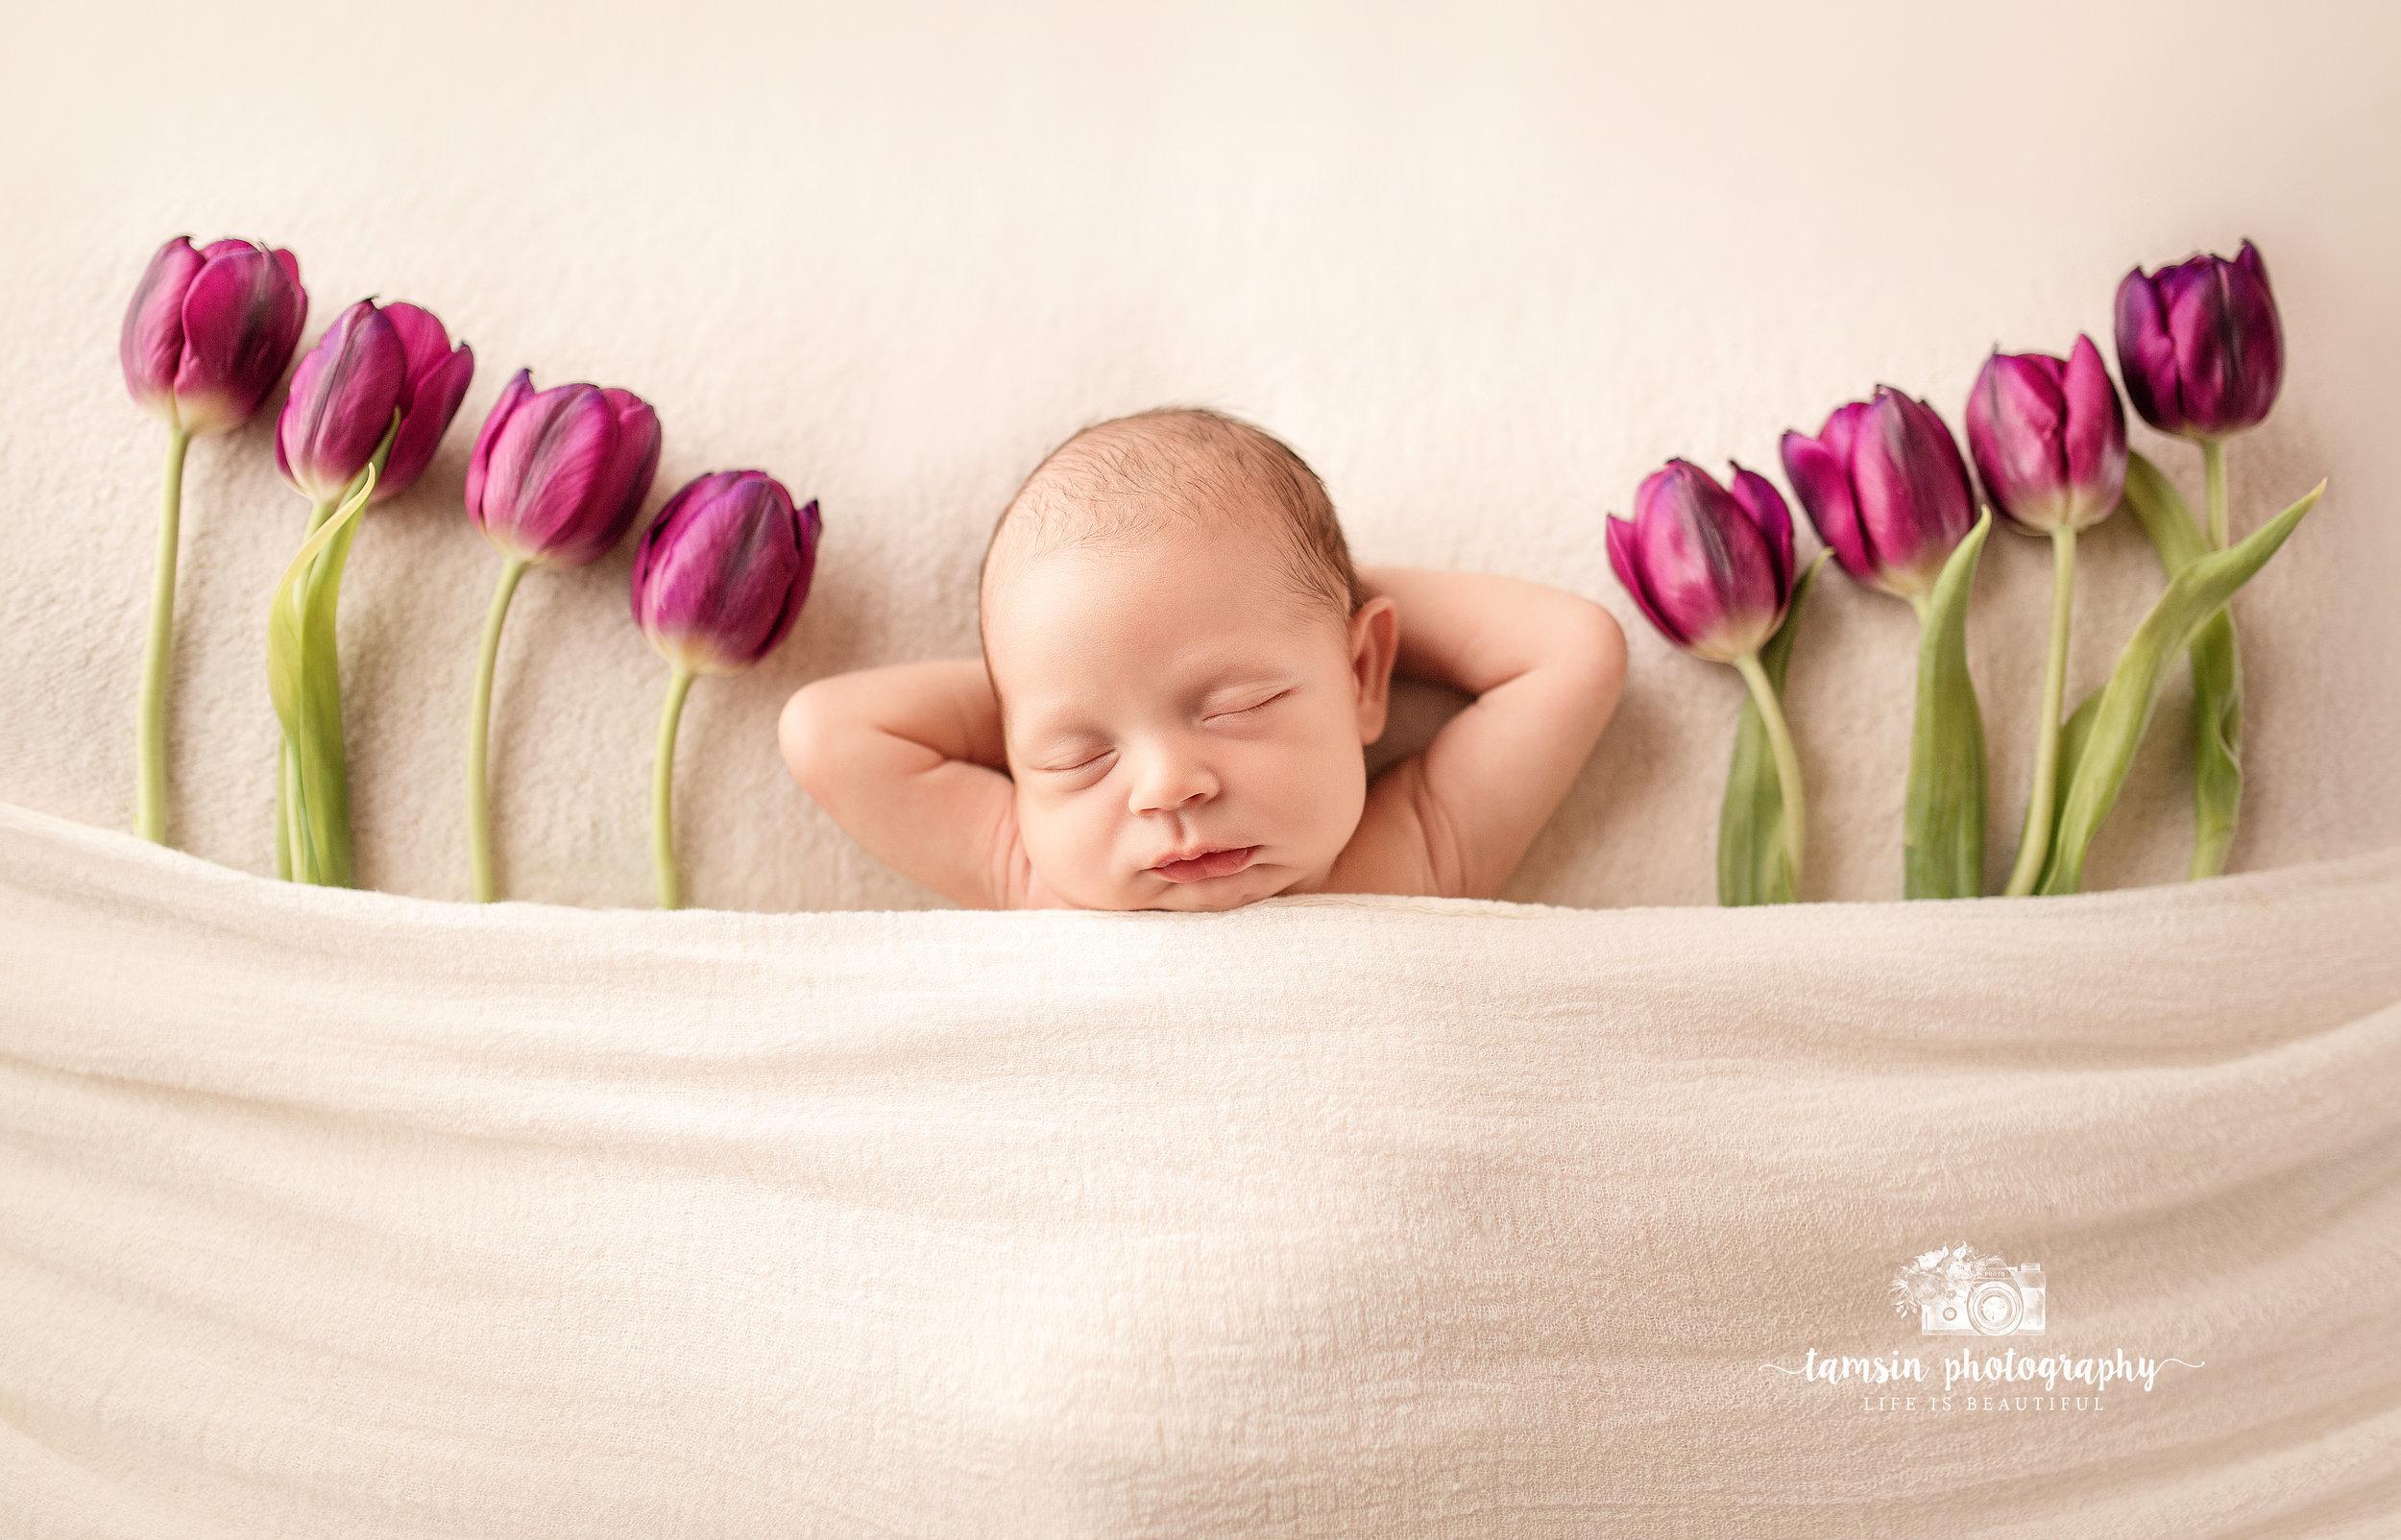 Newborn Portrait Tuips Spring Photography Tamsin.jpg